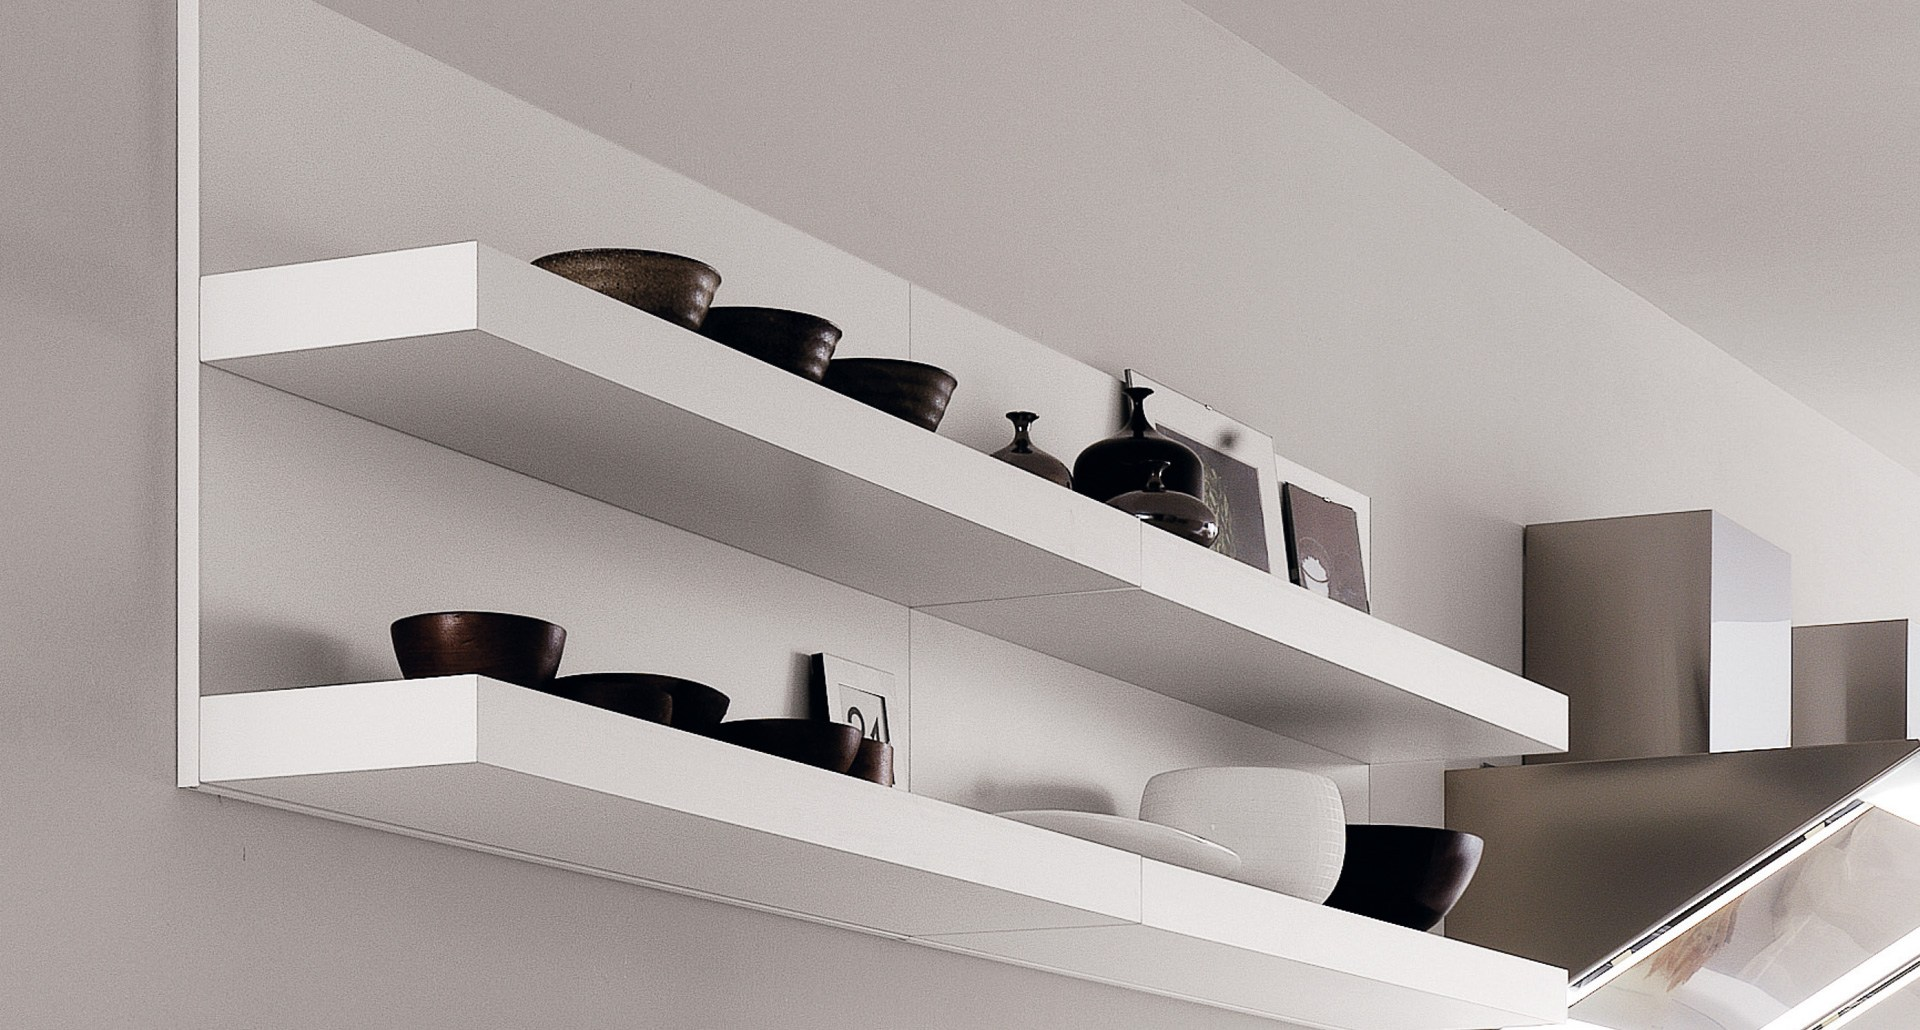 Beautiful Mensole Per Cucina Ikea Gallery - Skilifts.us - skilifts.us